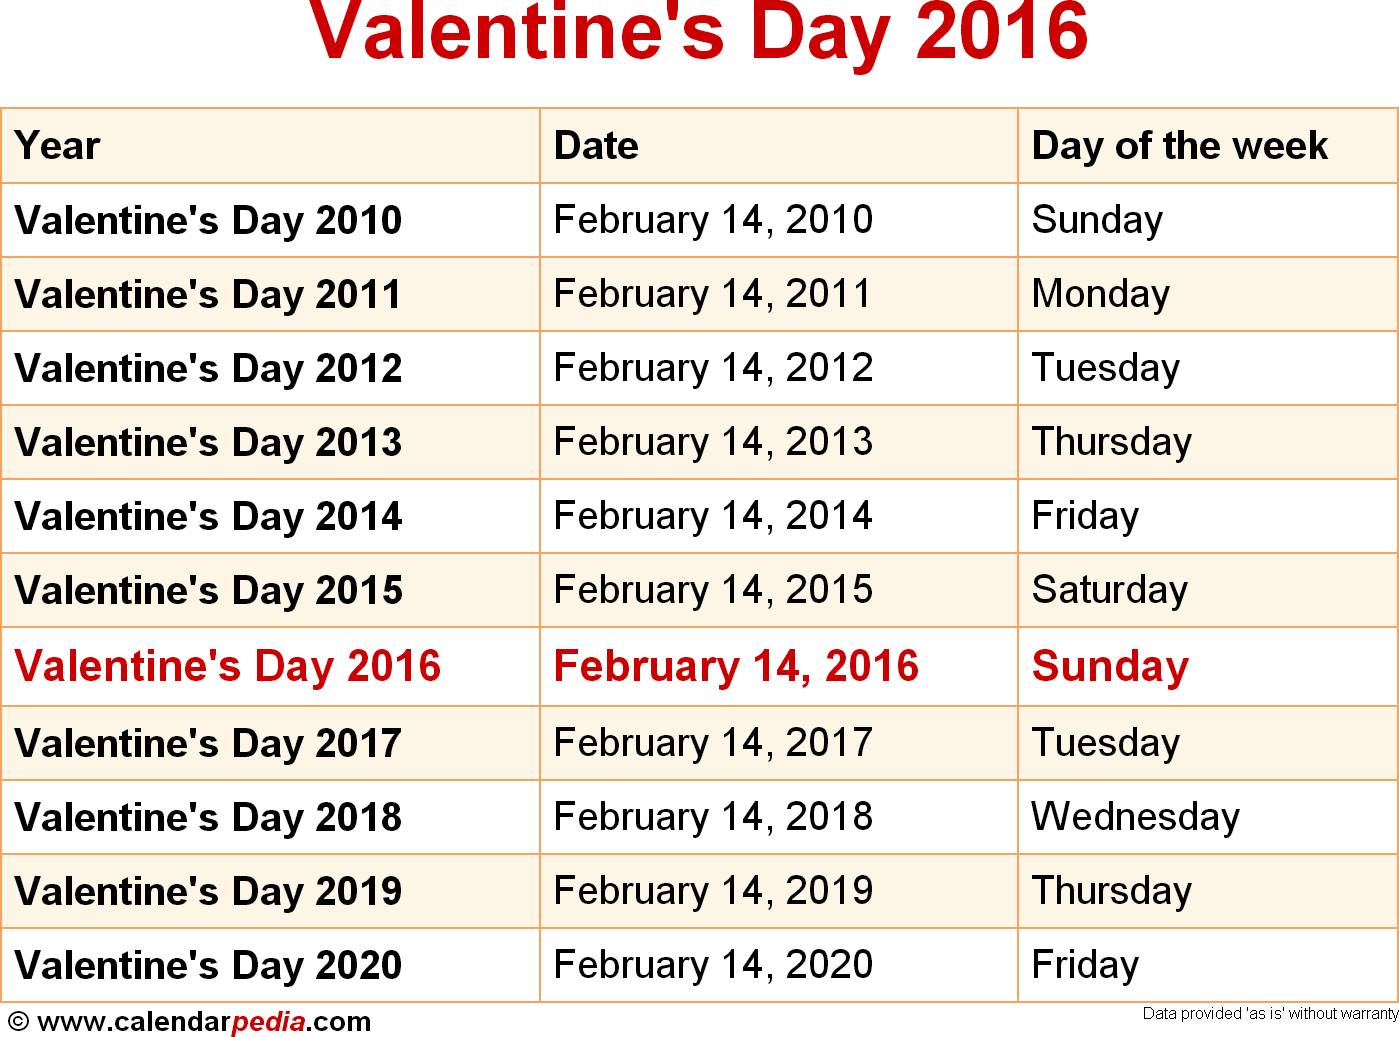 Valentine Week List Of 2016 - Complete Date Sheet